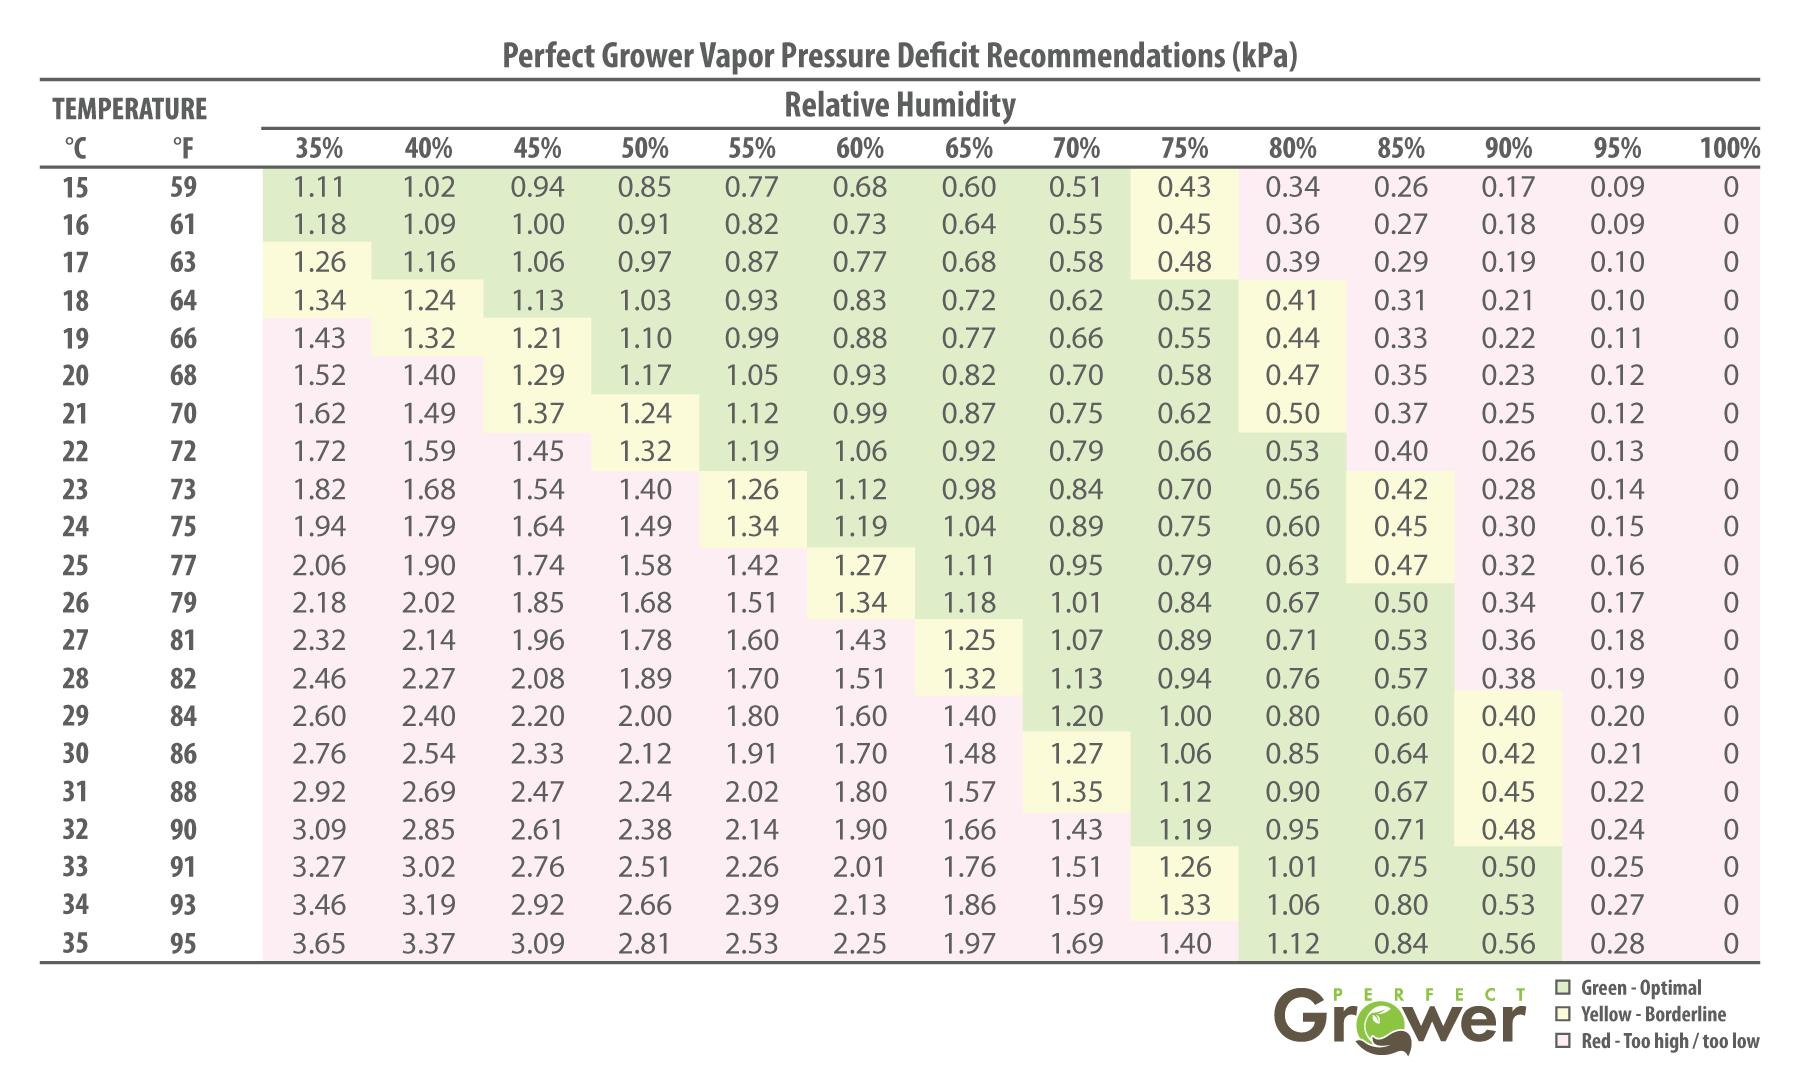 VPD chart - vapor pressure deficit